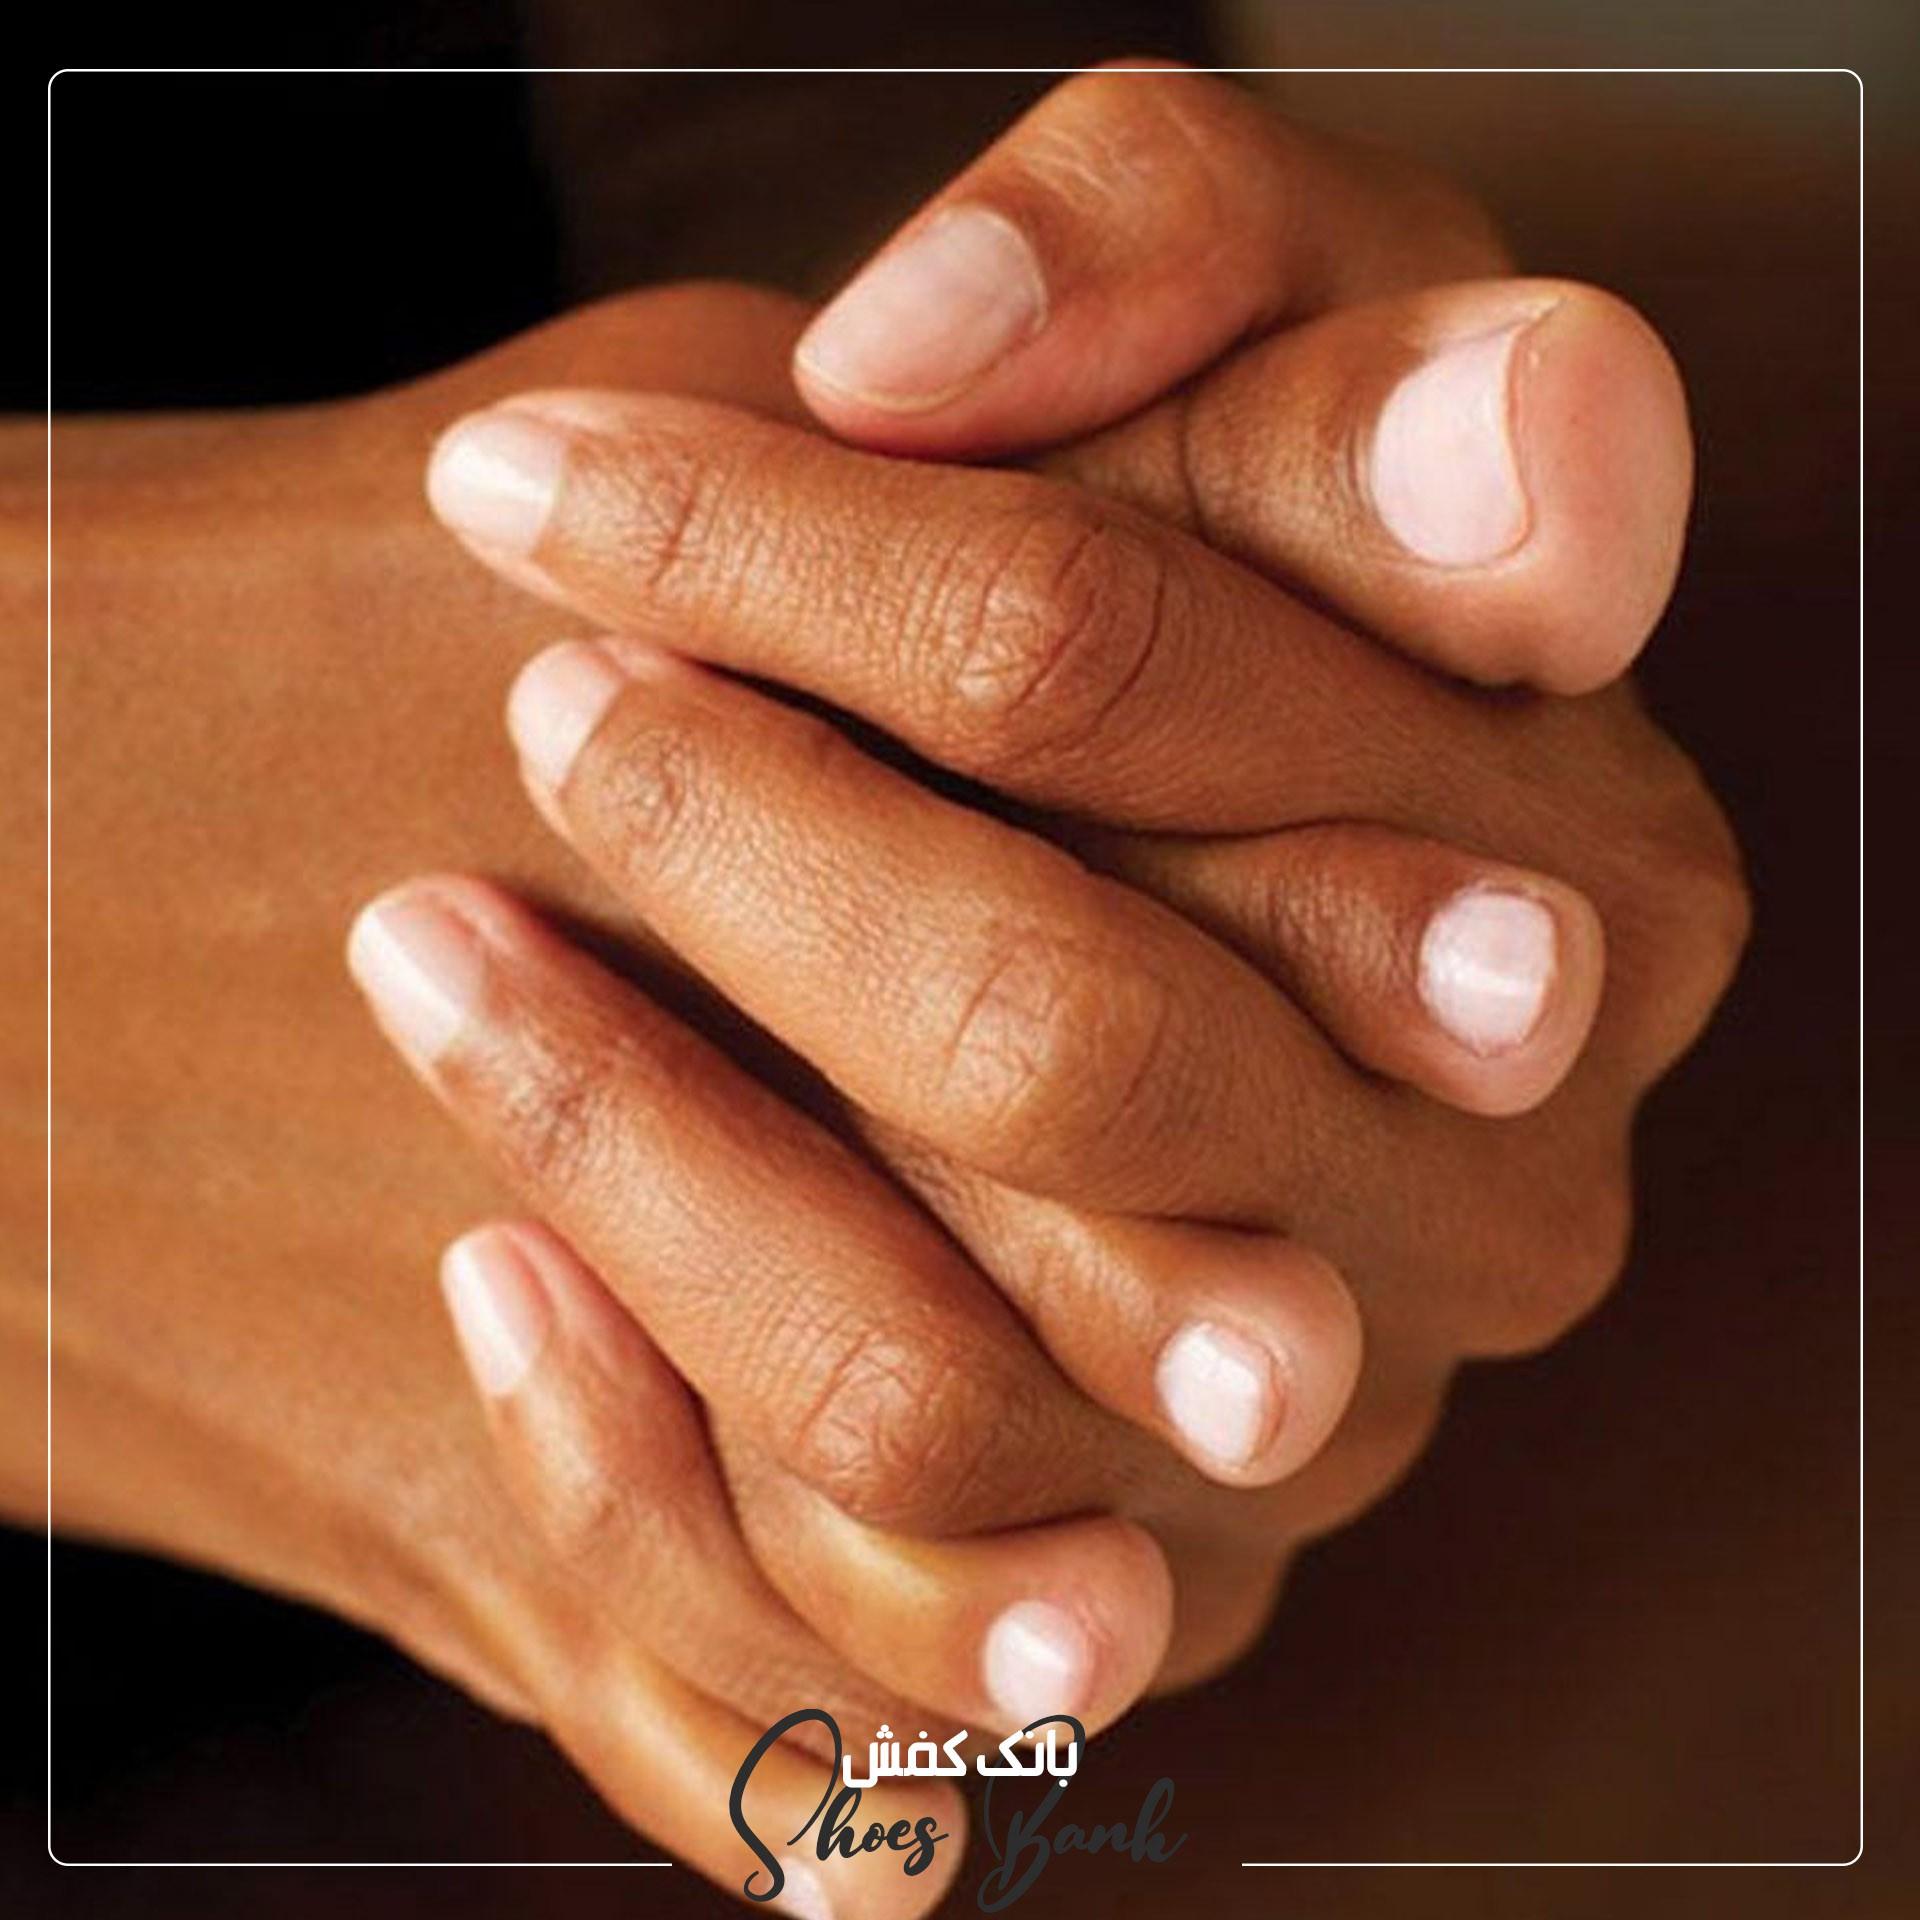 ماساژ بین انگشتان